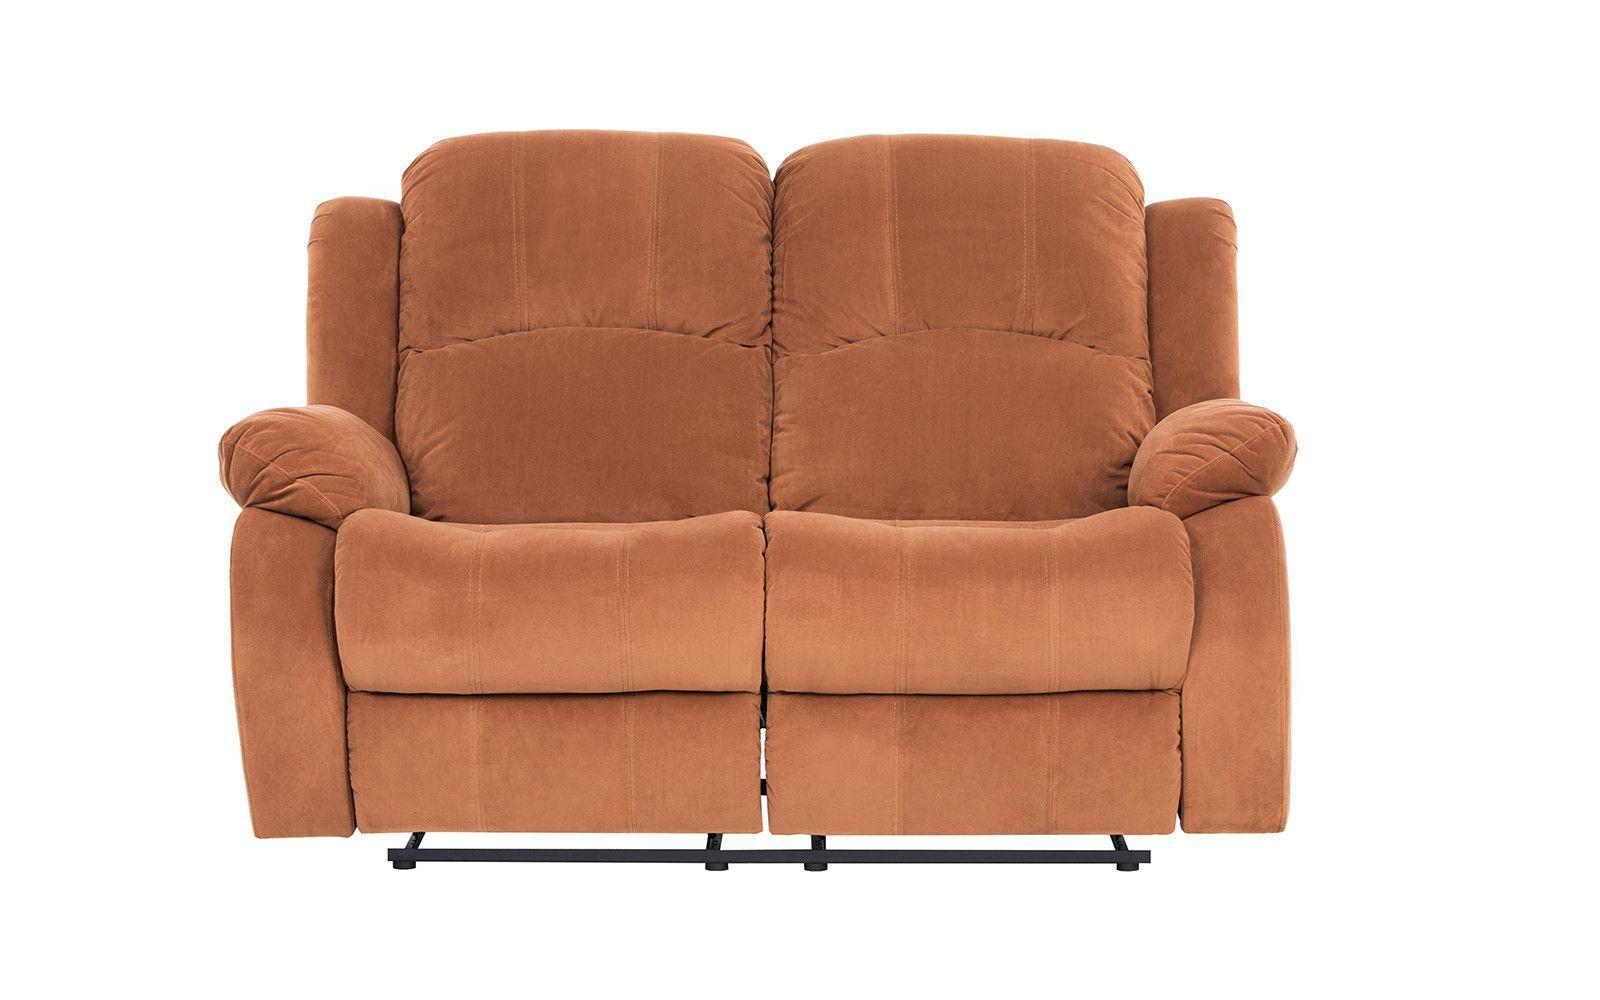 Excellent Traditional Brown Brush Microfiber Recliner Loveseat Unemploymentrelief Wooden Chair Designs For Living Room Unemploymentrelieforg